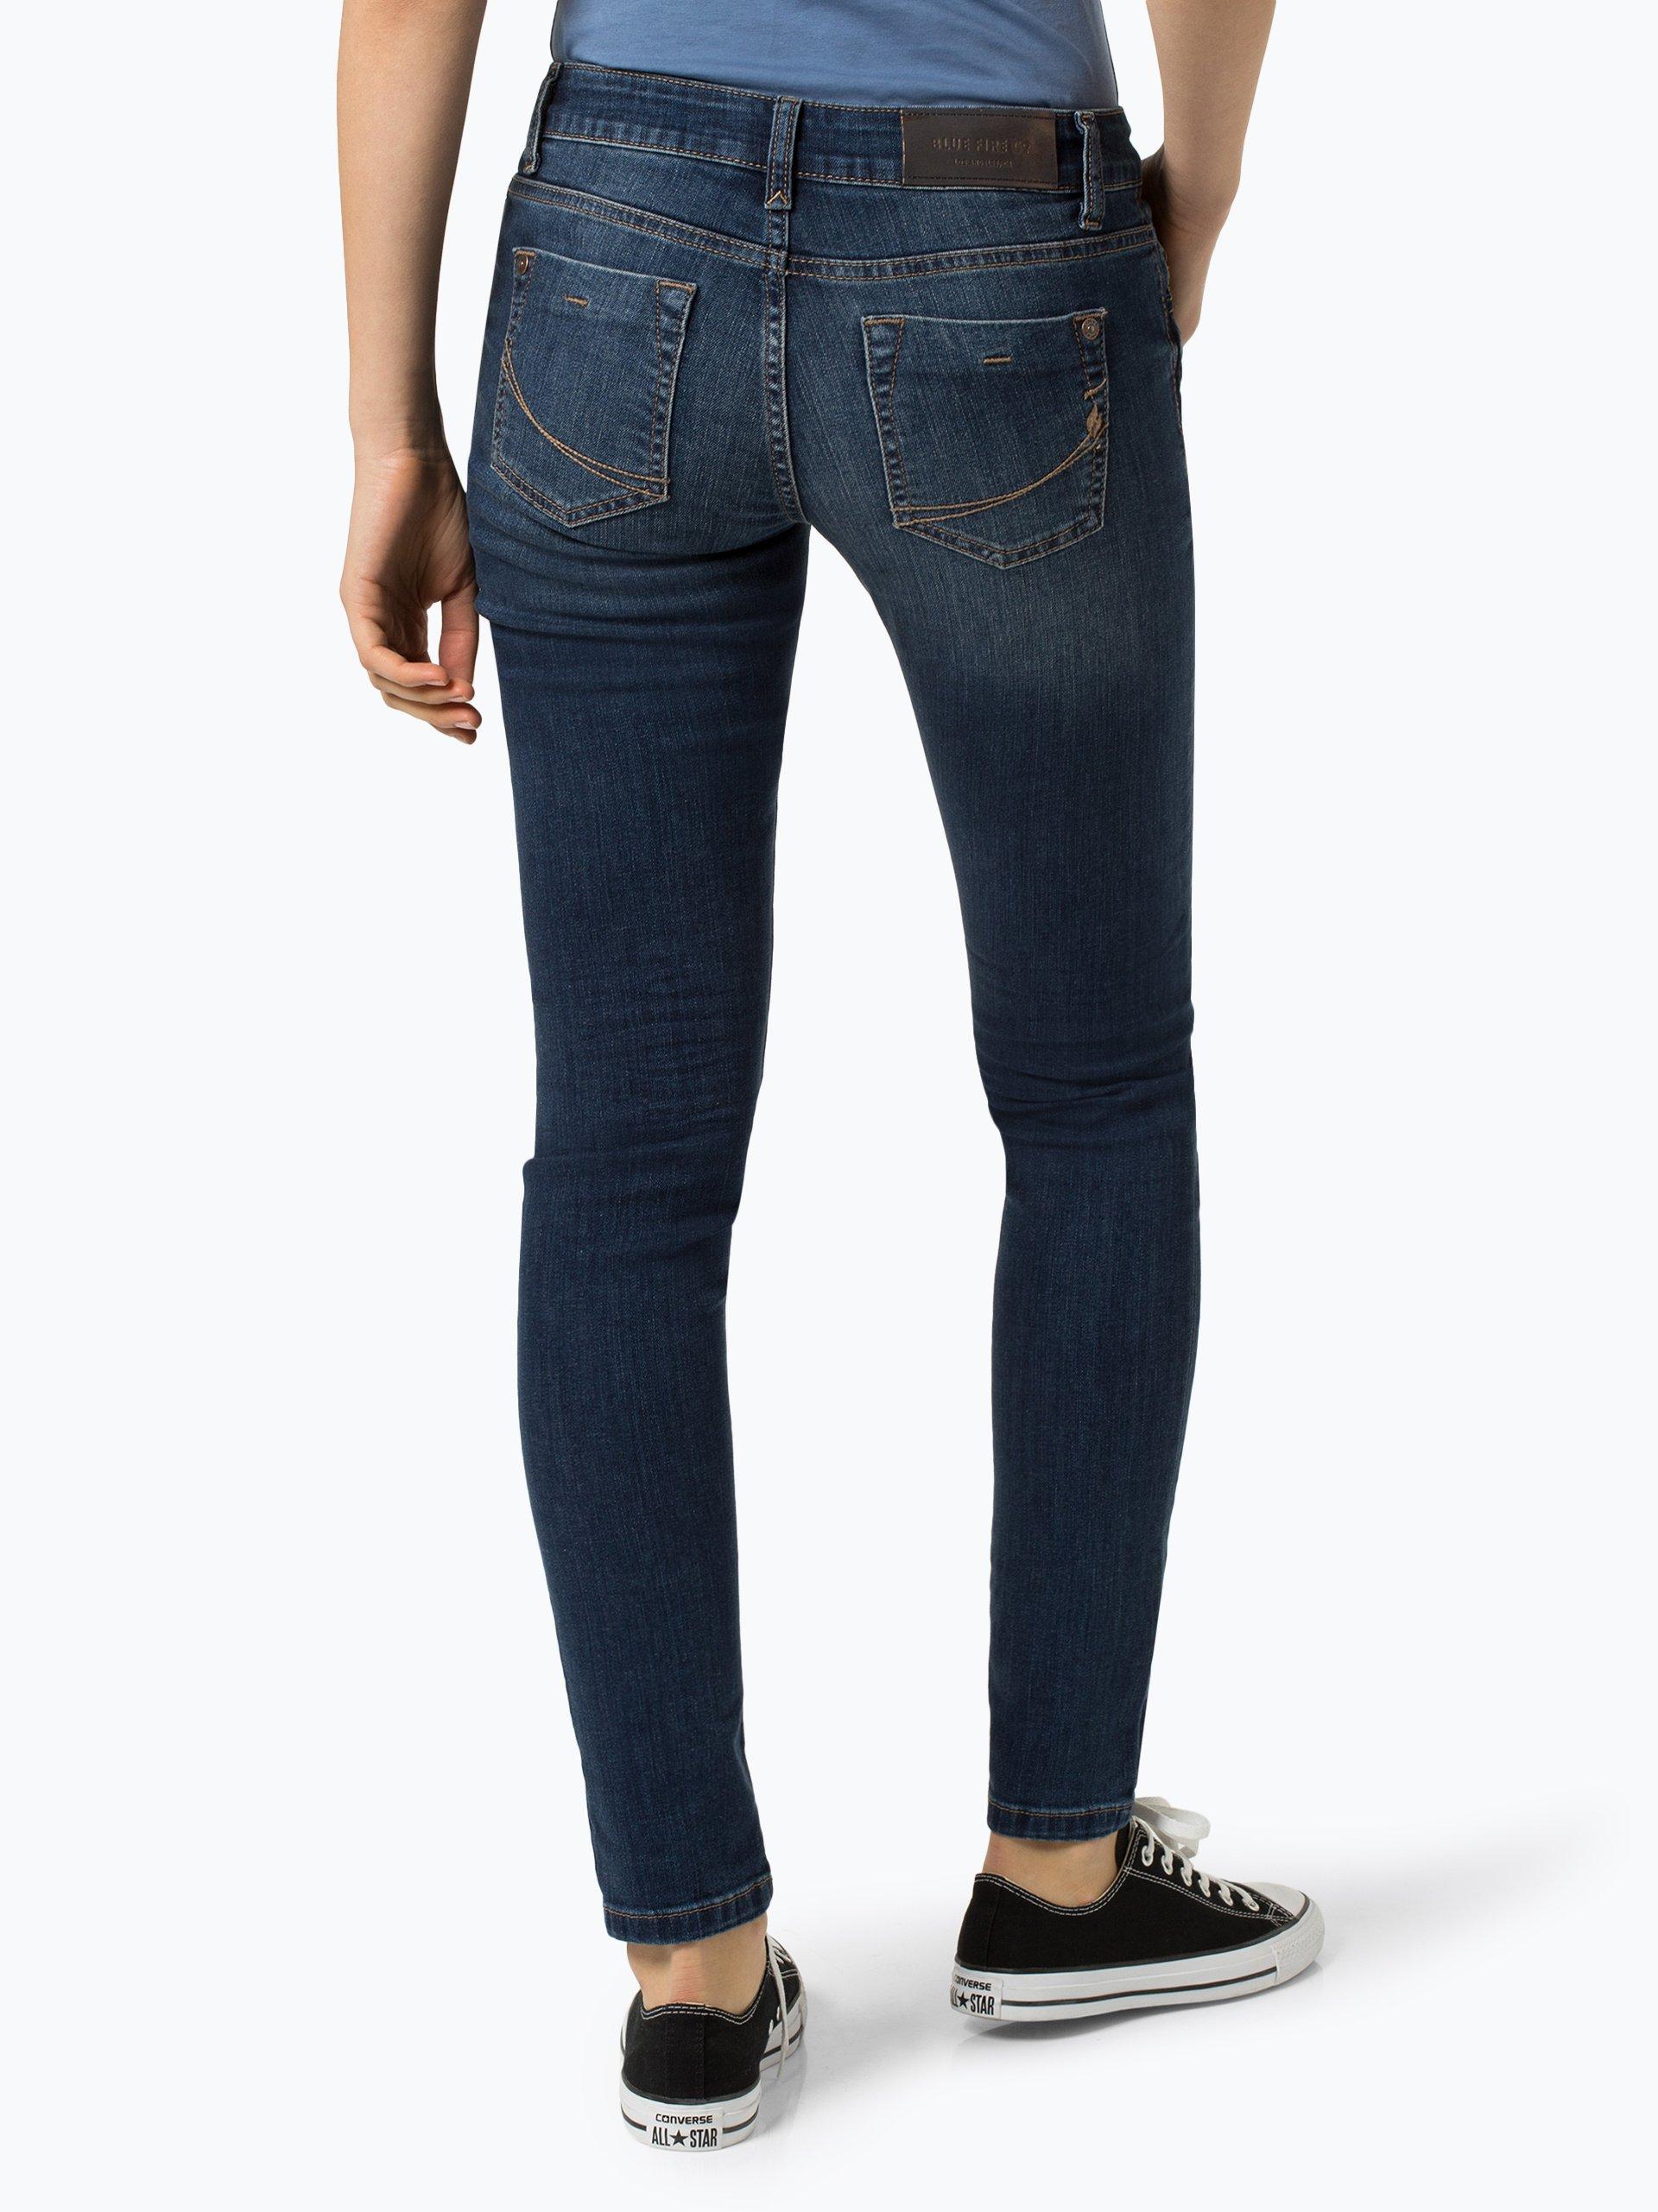 Blue Fire Damen Jeans - Tyra